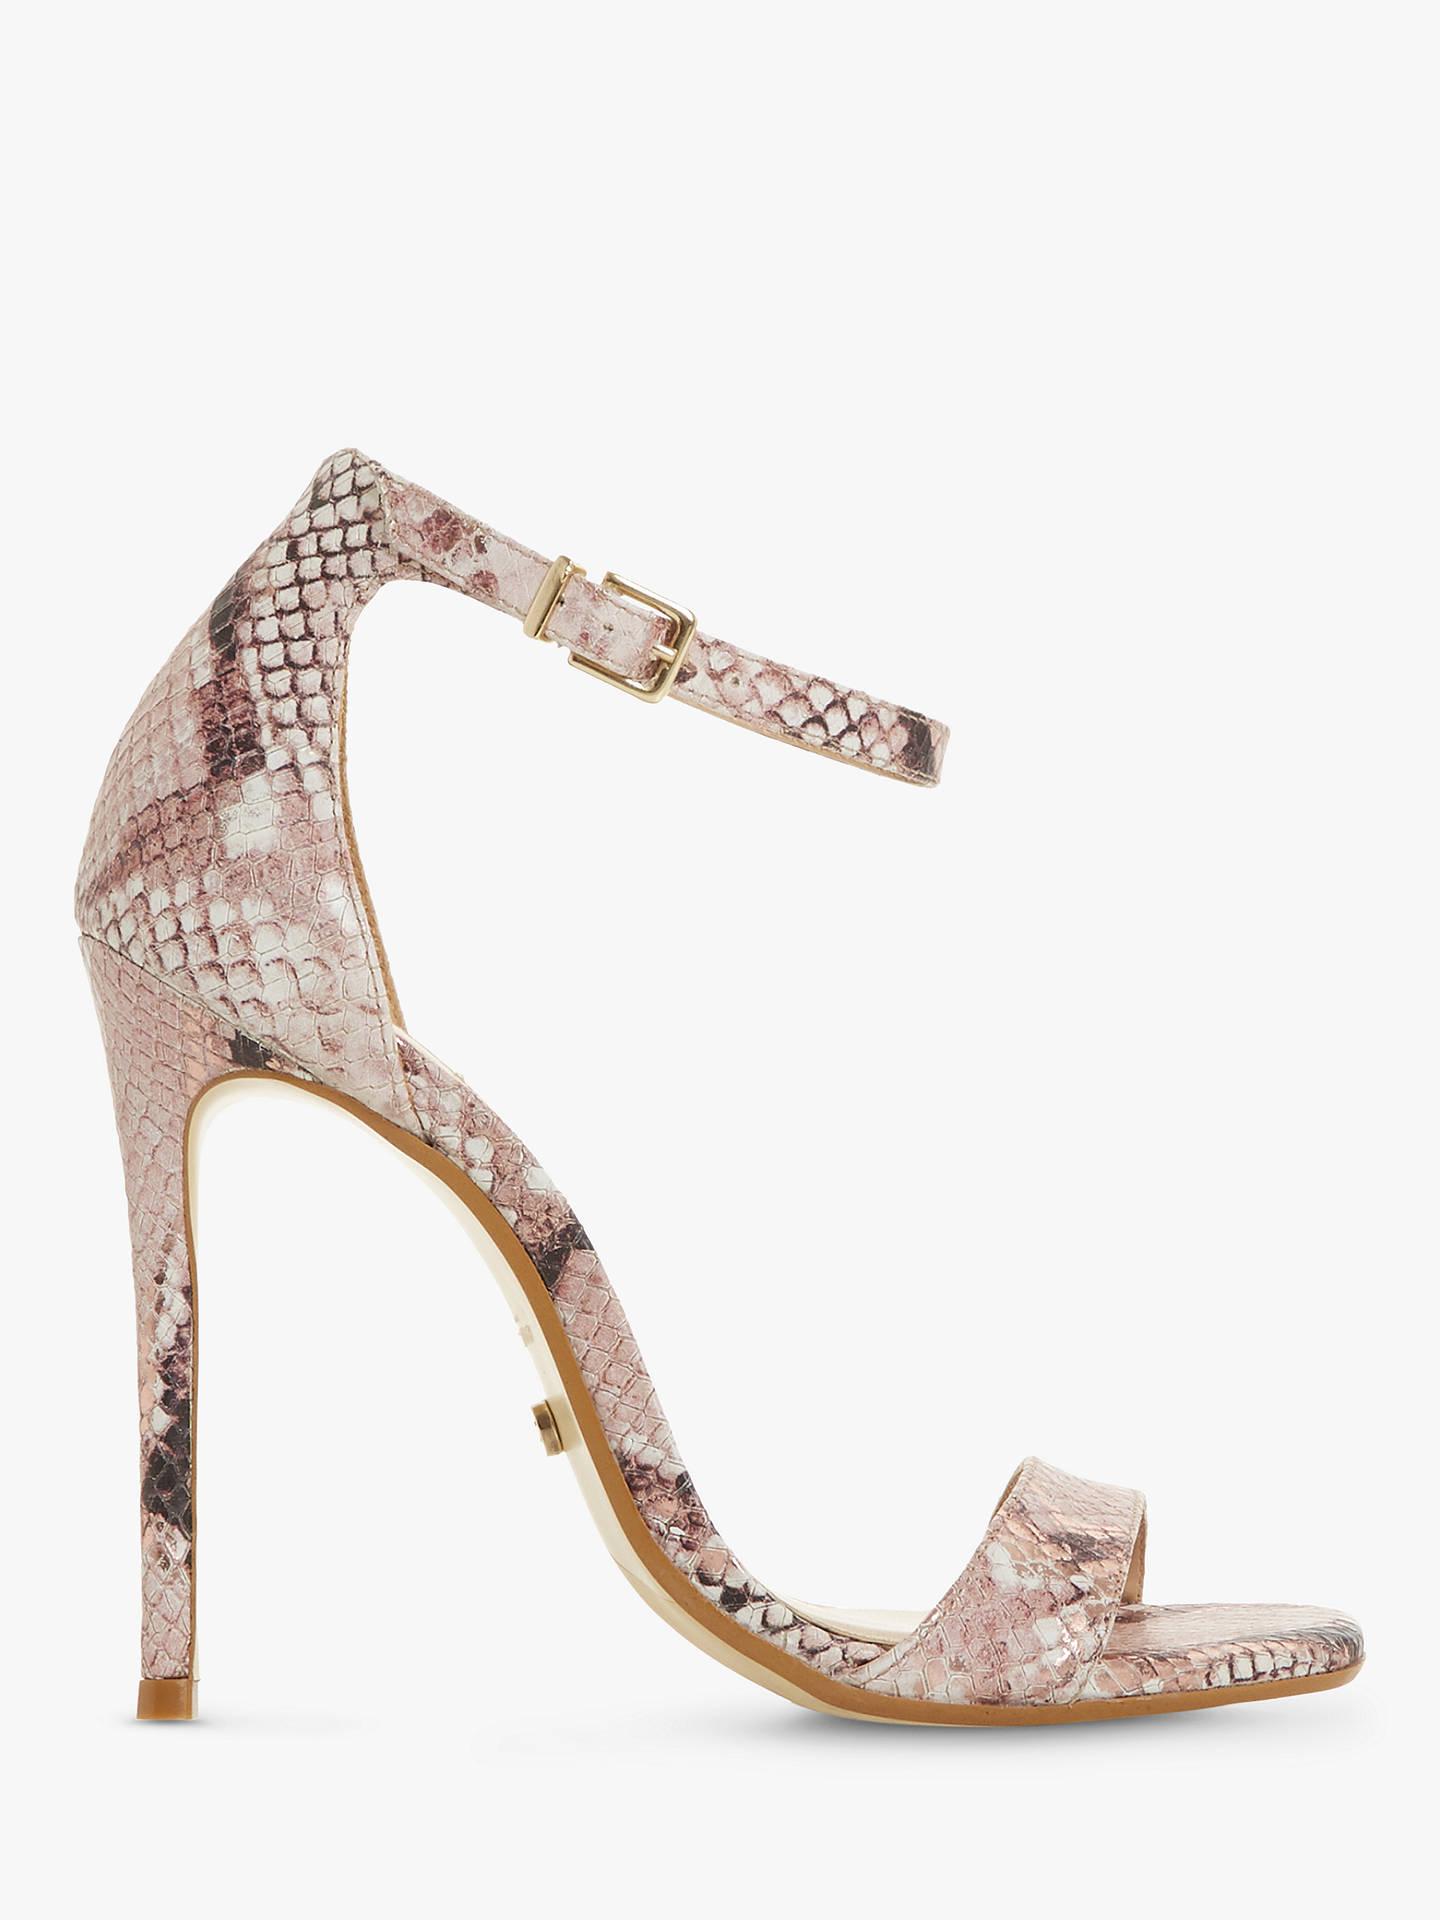 9b4479396e37 Buy Dune Moxie Stiletto Heel Sandals, Pink Leather, 3 Online at  johnlewis.com ...